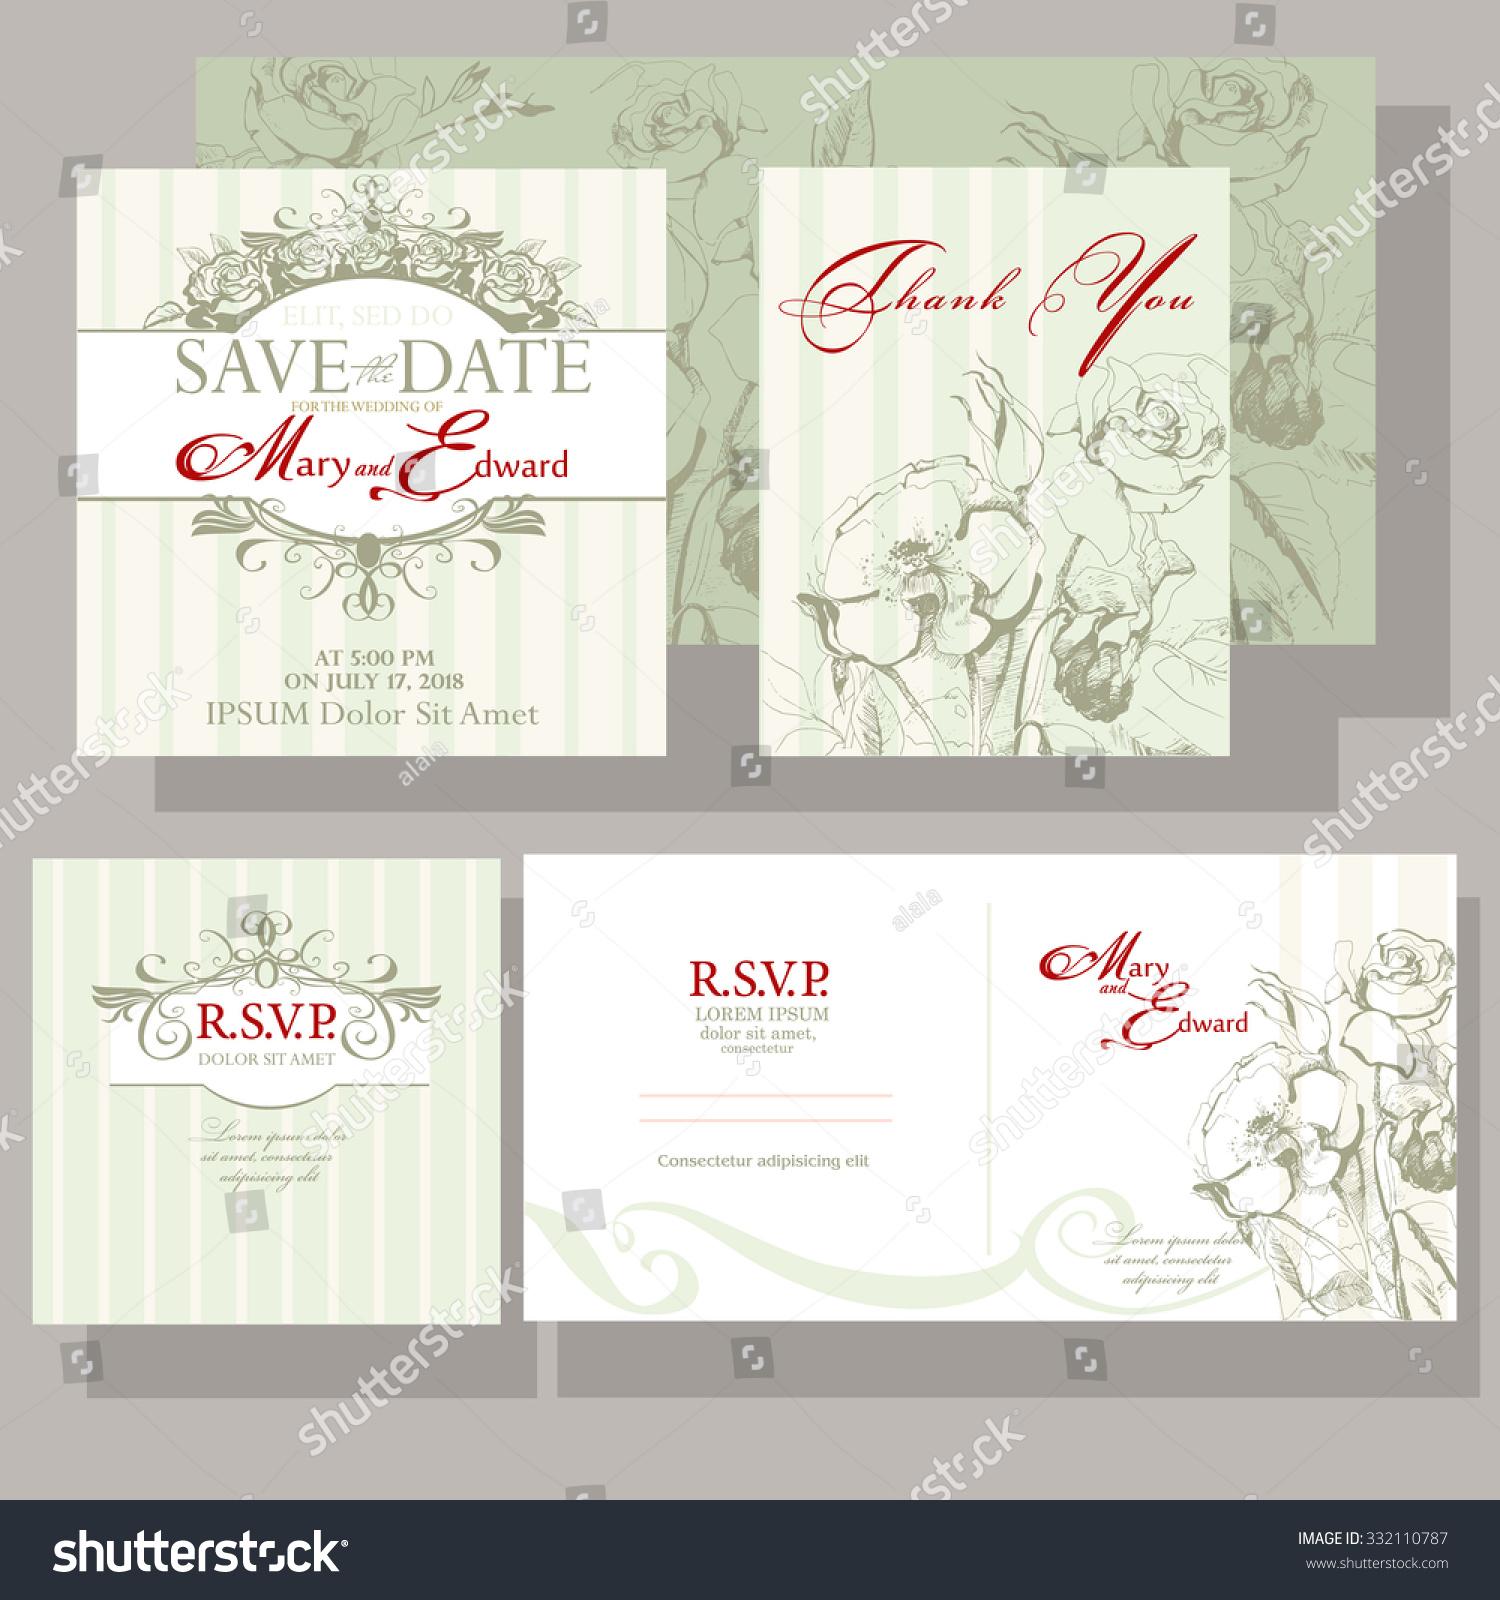 Wedding Invitation Roses Design Resource Reservation Stock Vector ...